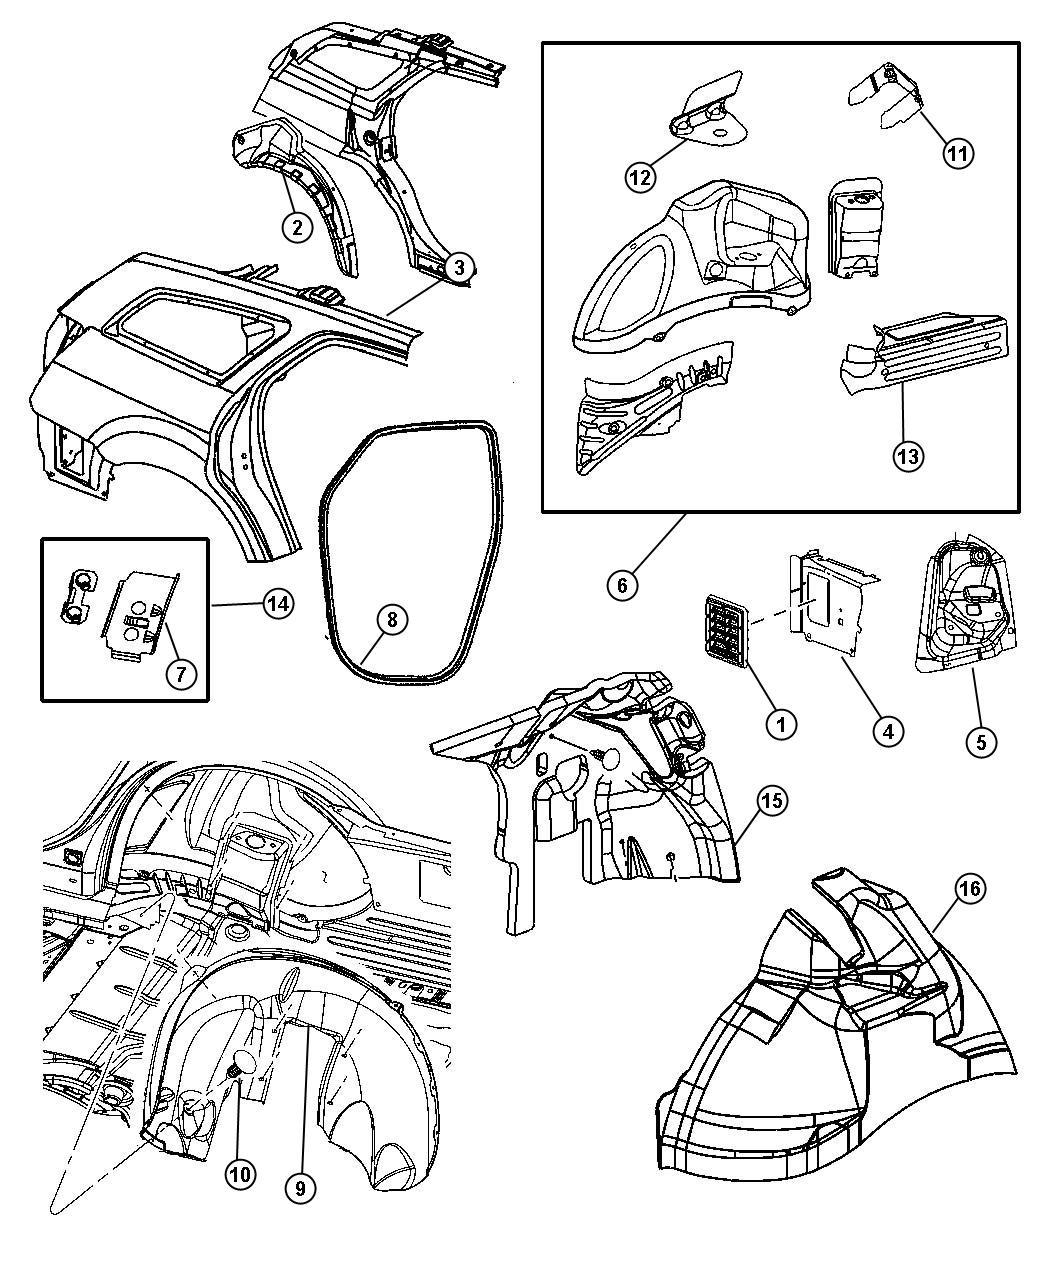 Dodge Pin Push In M8 X 1 25 X 20 Fascia Attaching